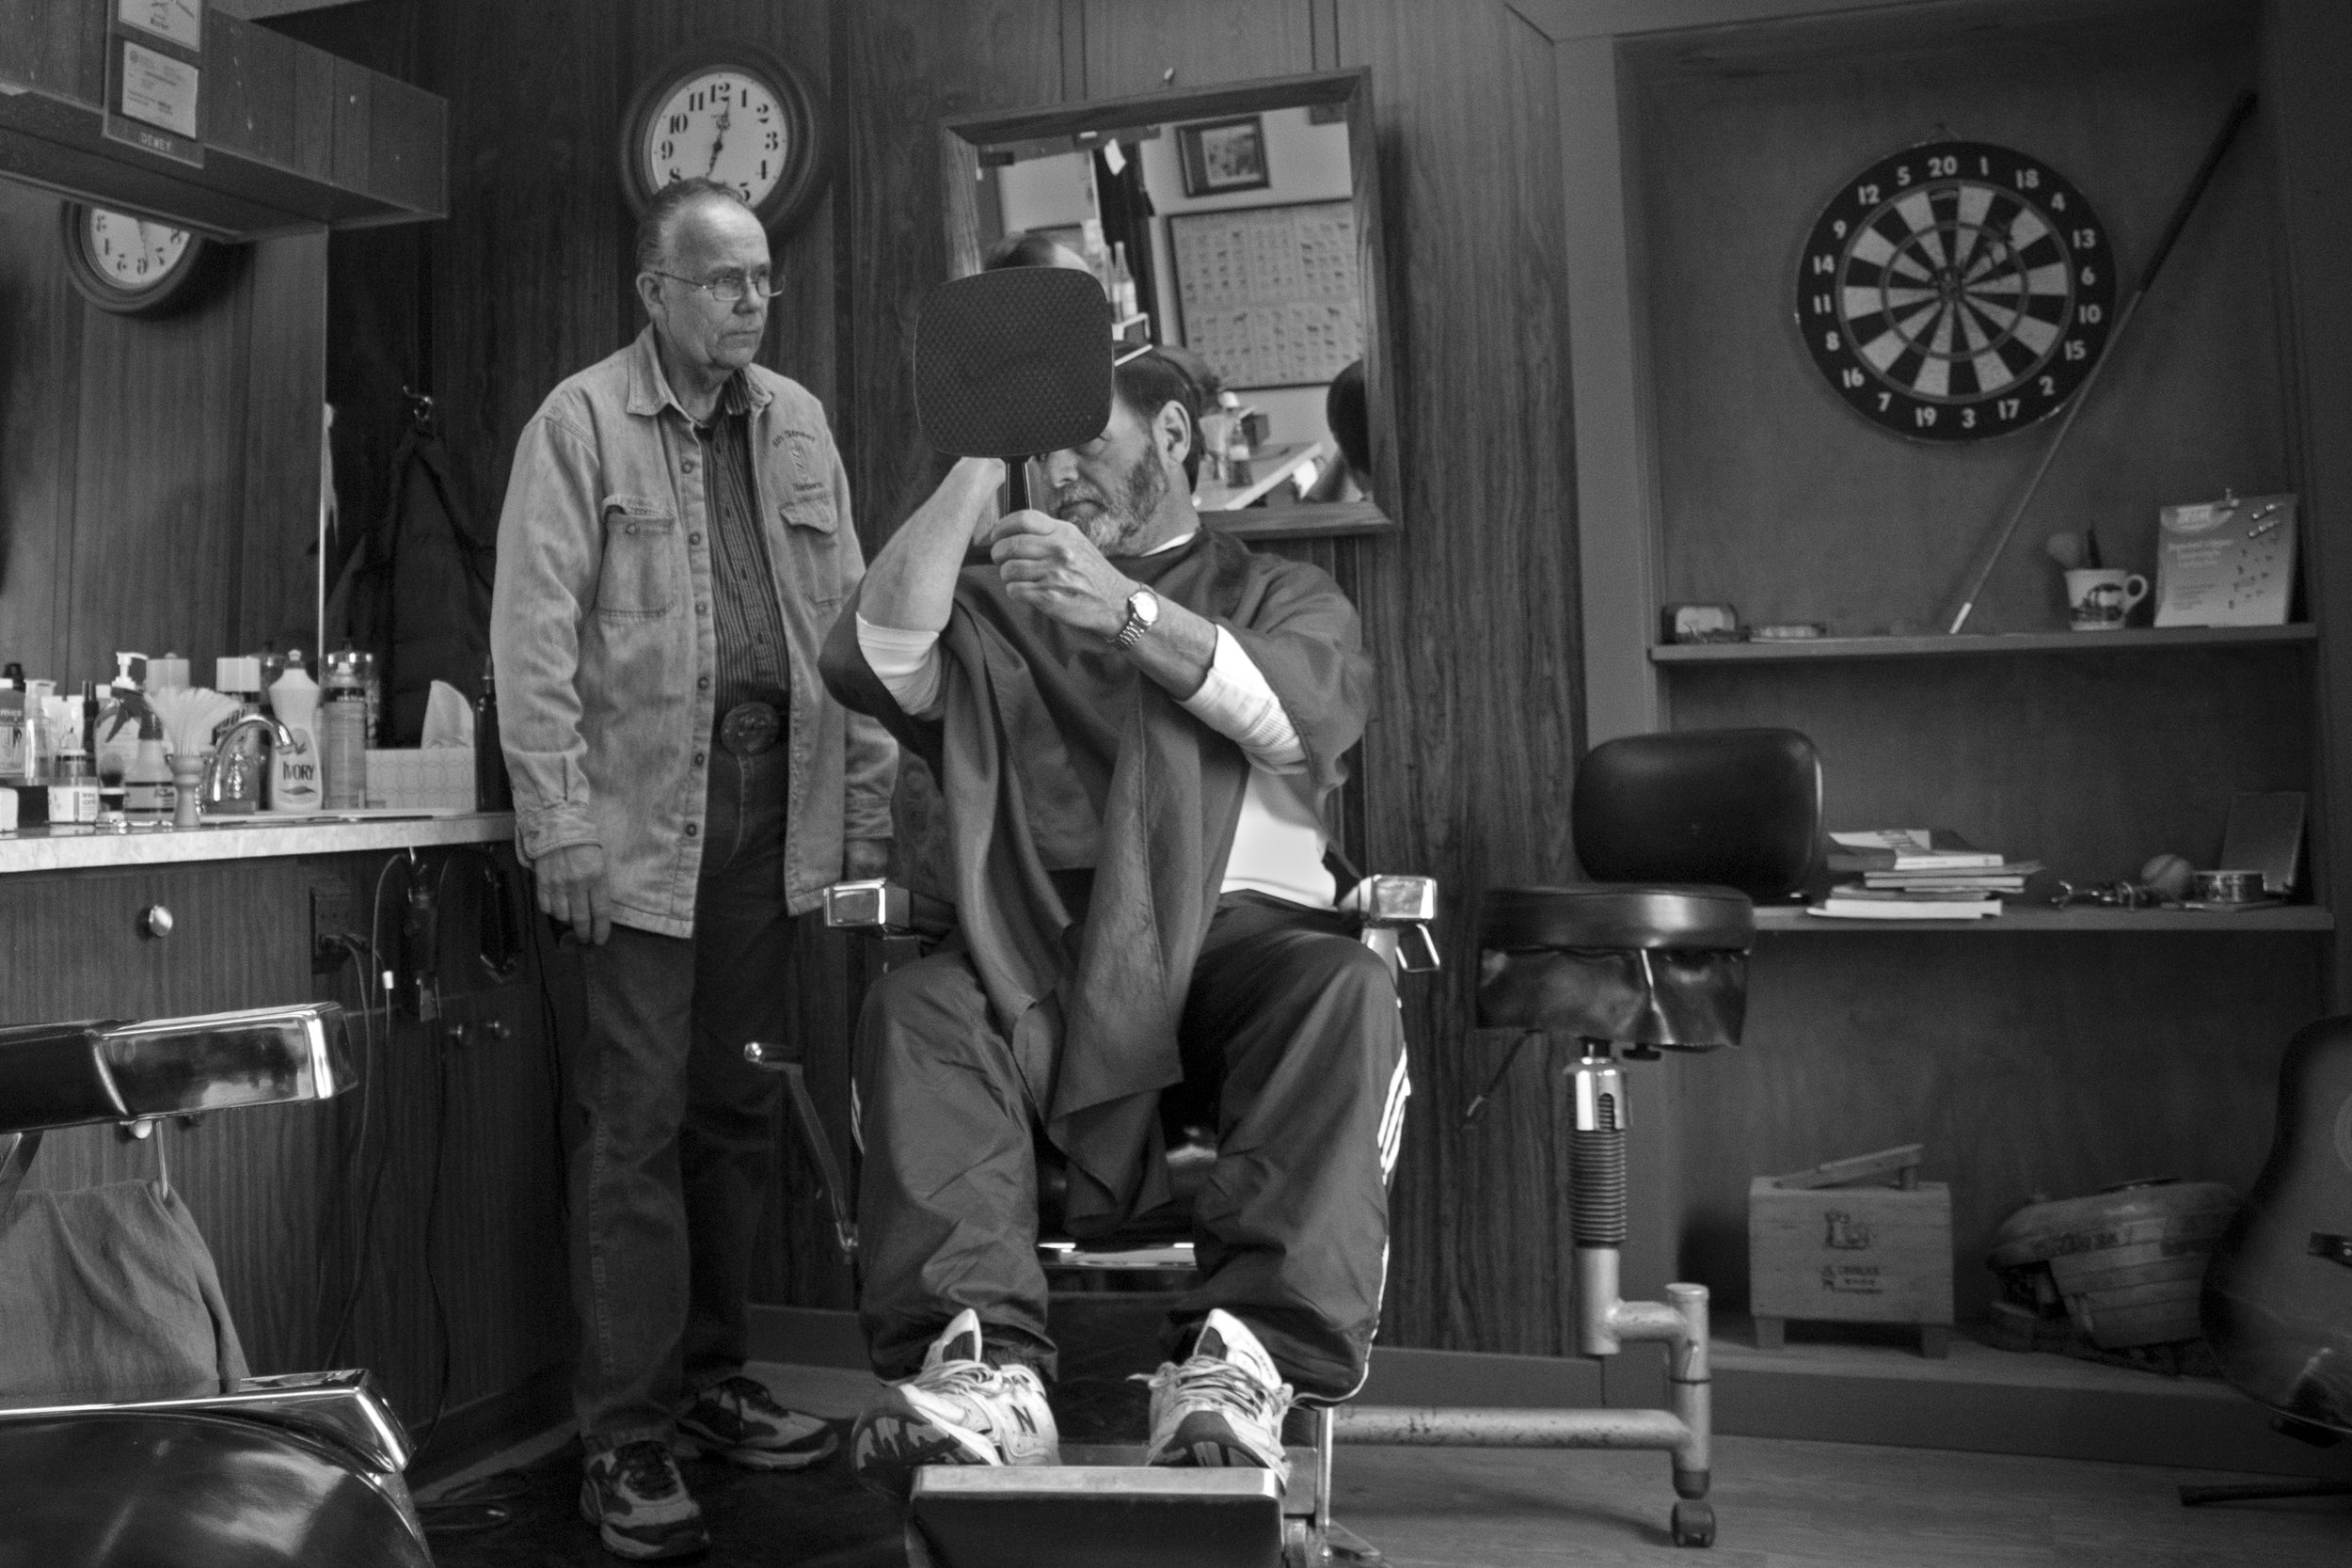 8th Street Barber